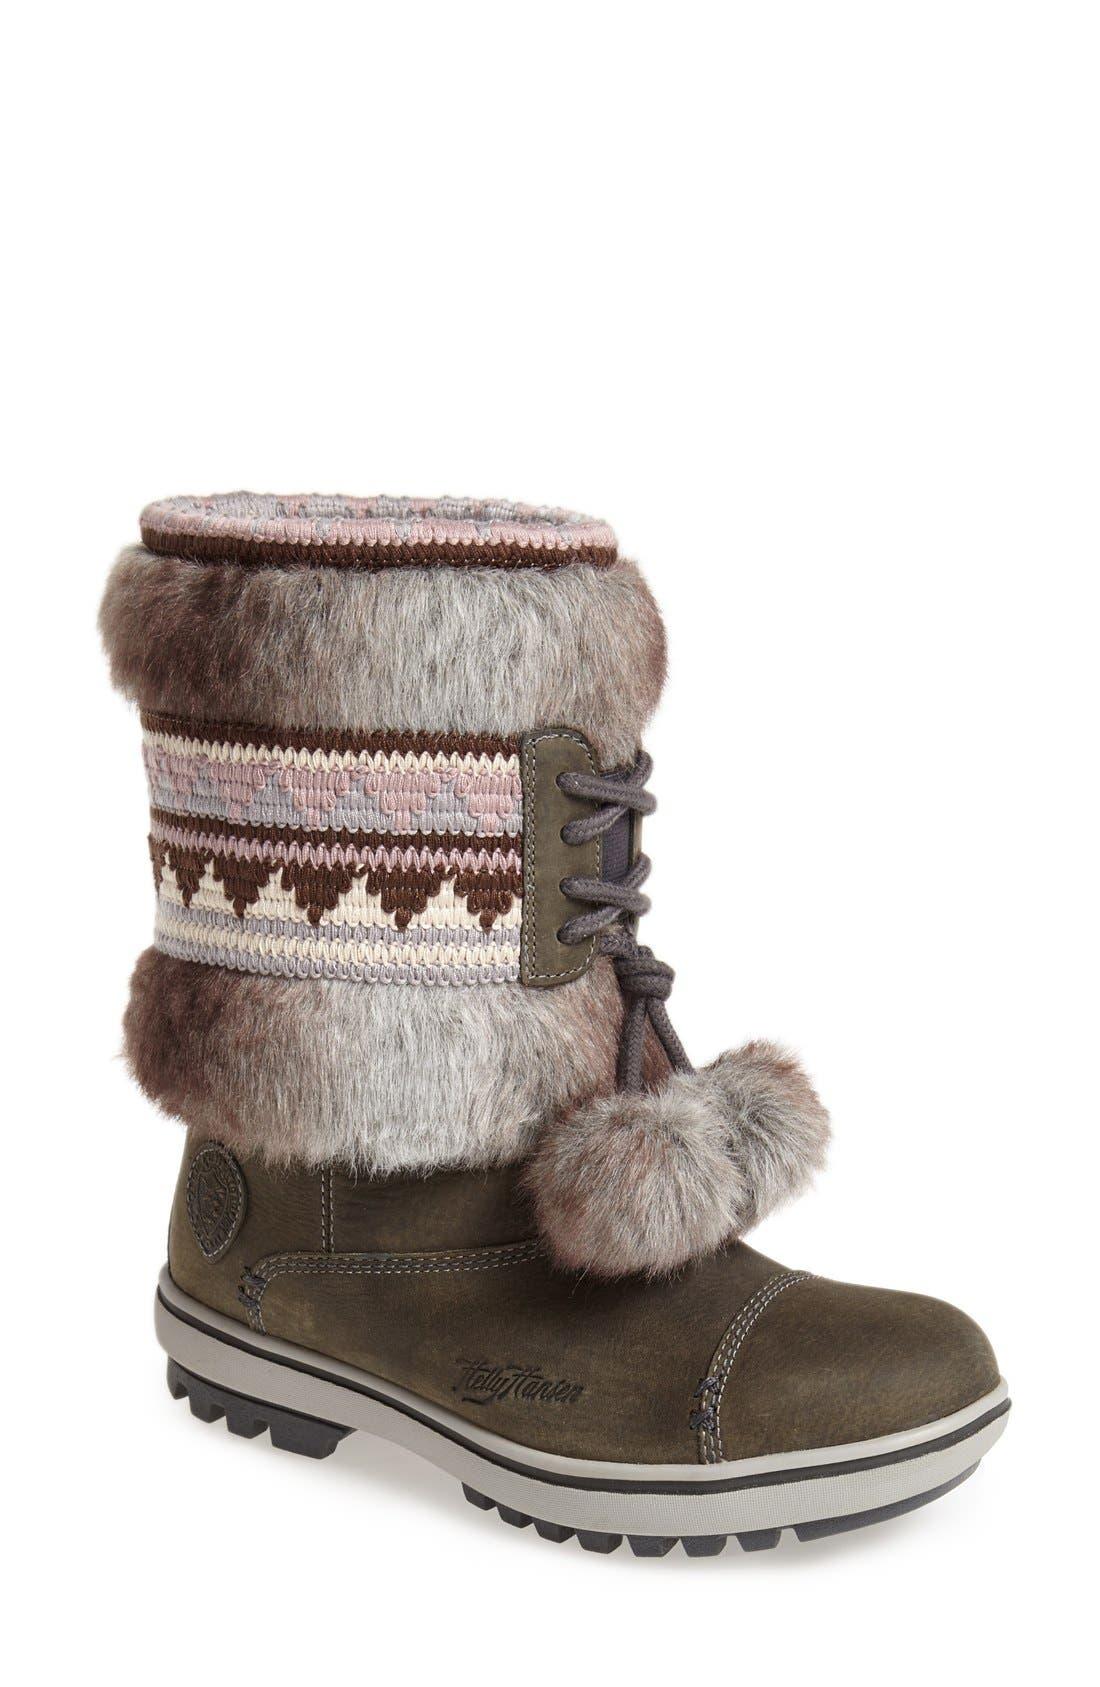 Alternate Image 1 Selected - Helly Hansen 'Iskoras' Waterproof Leather Snow Boot (Women)